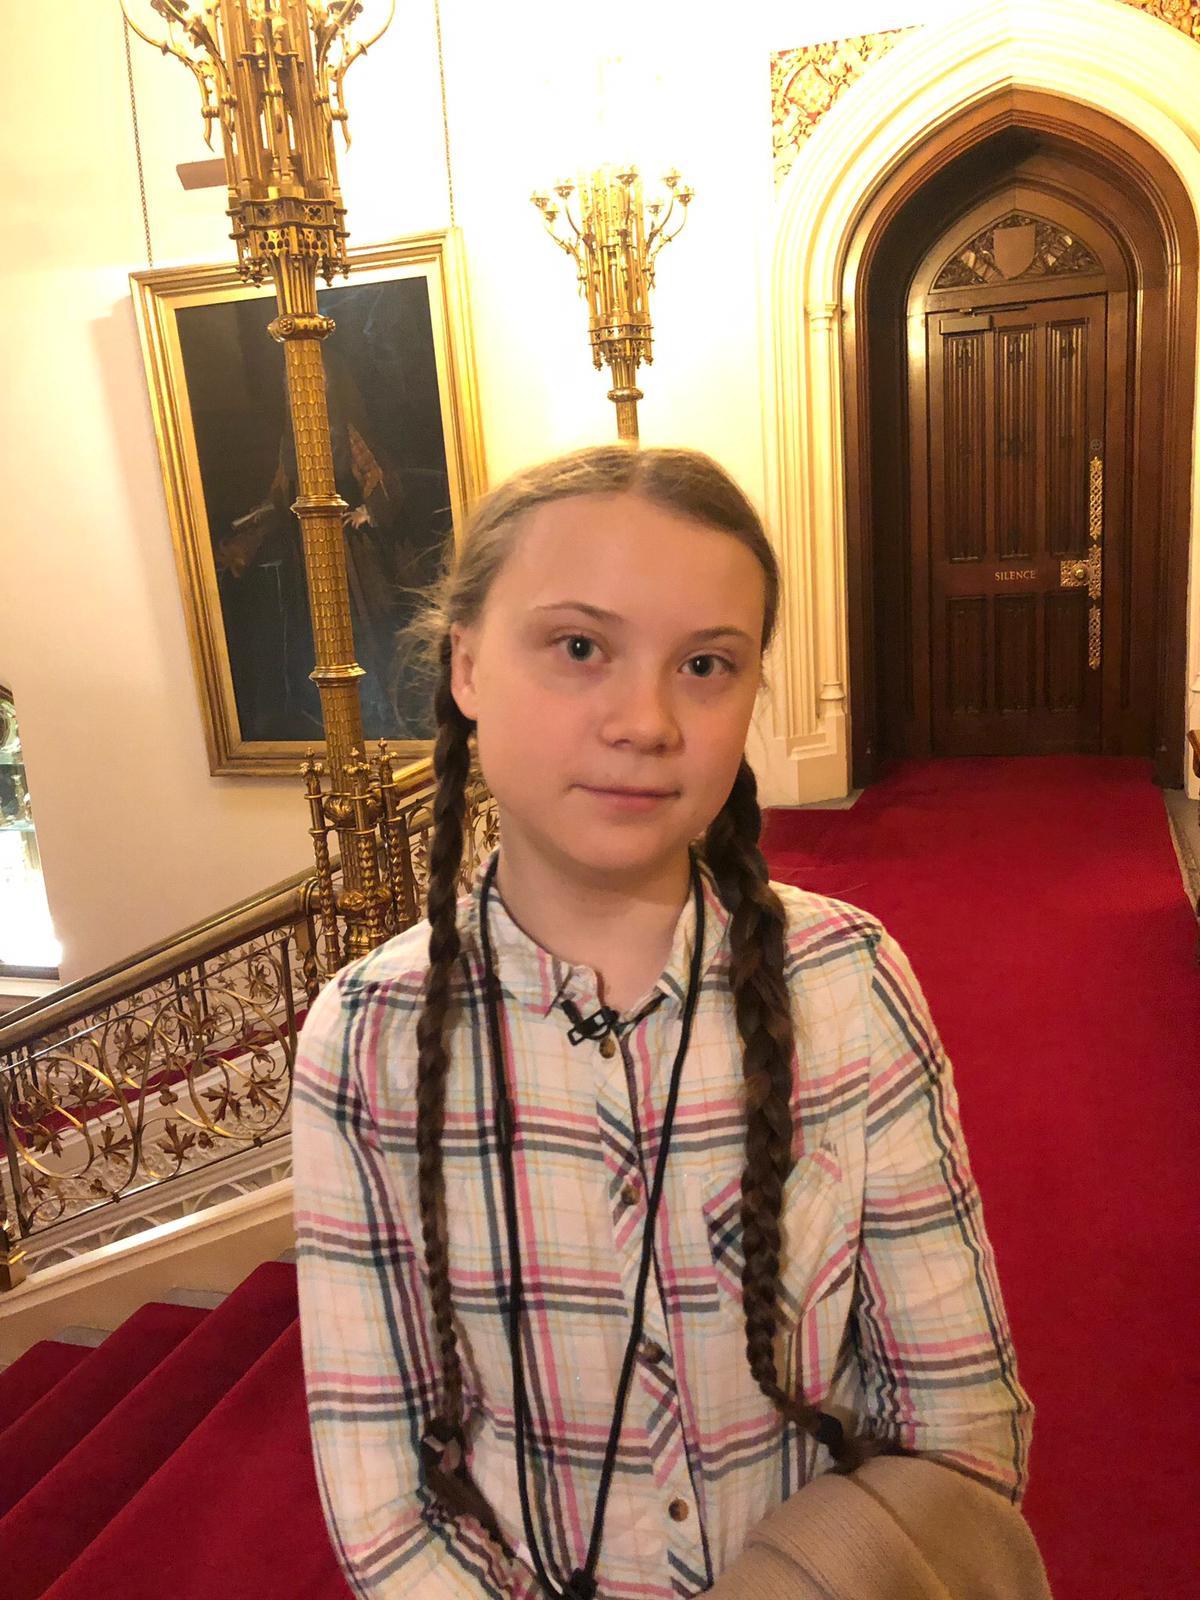 Teenage activist Greta Thunberg takes climate protest to Trump